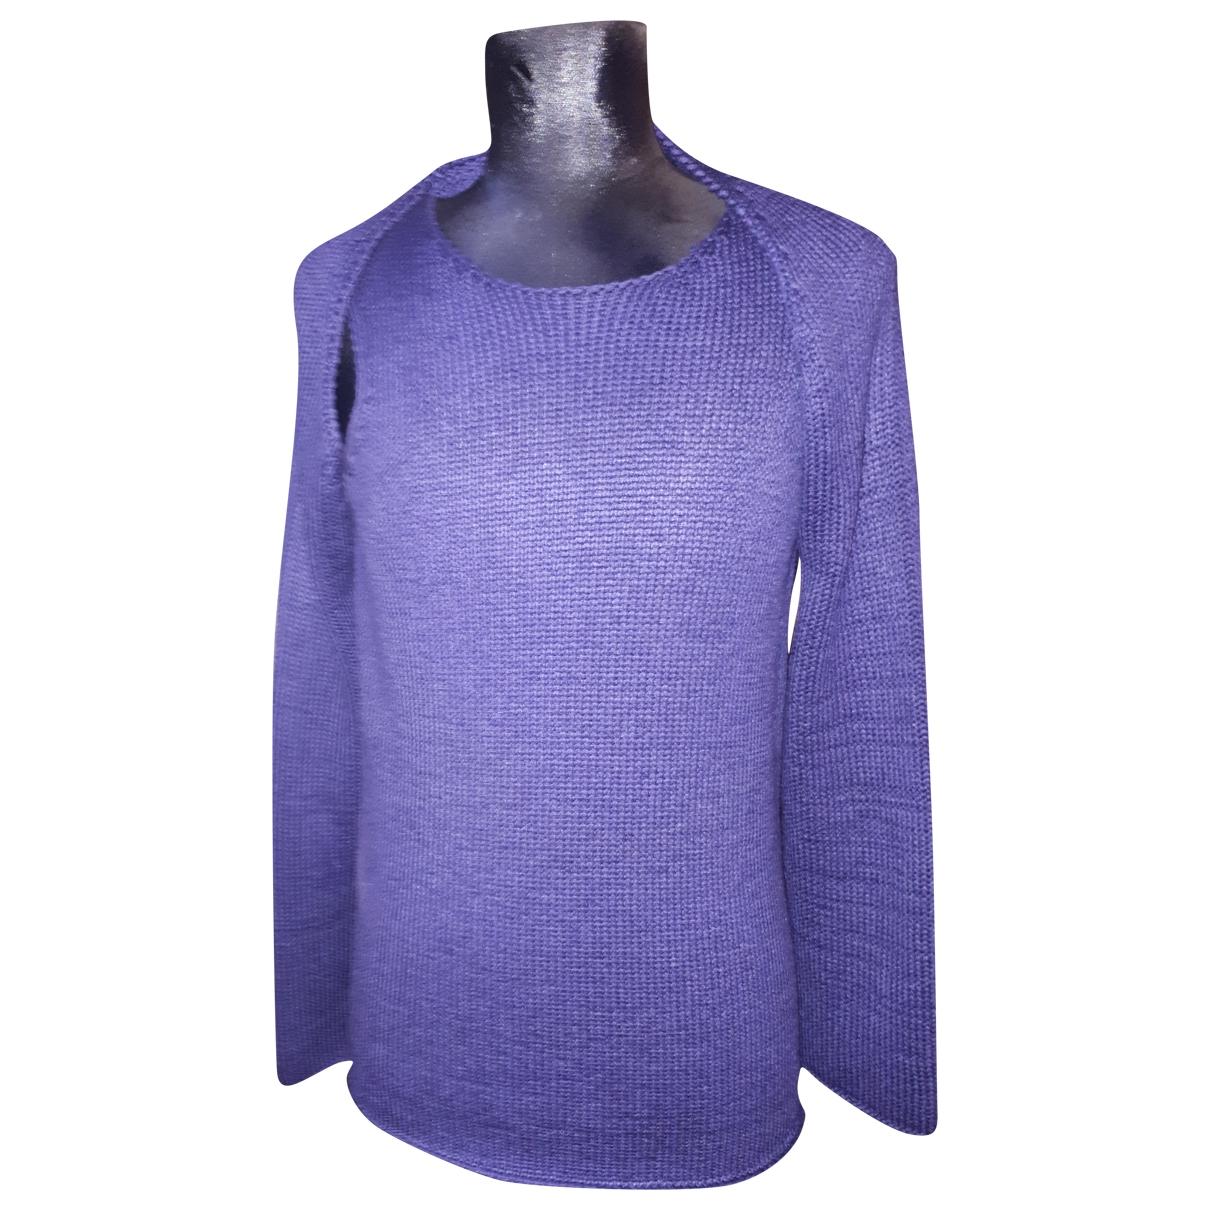 Hermes \N Pullover in  Lila Seide